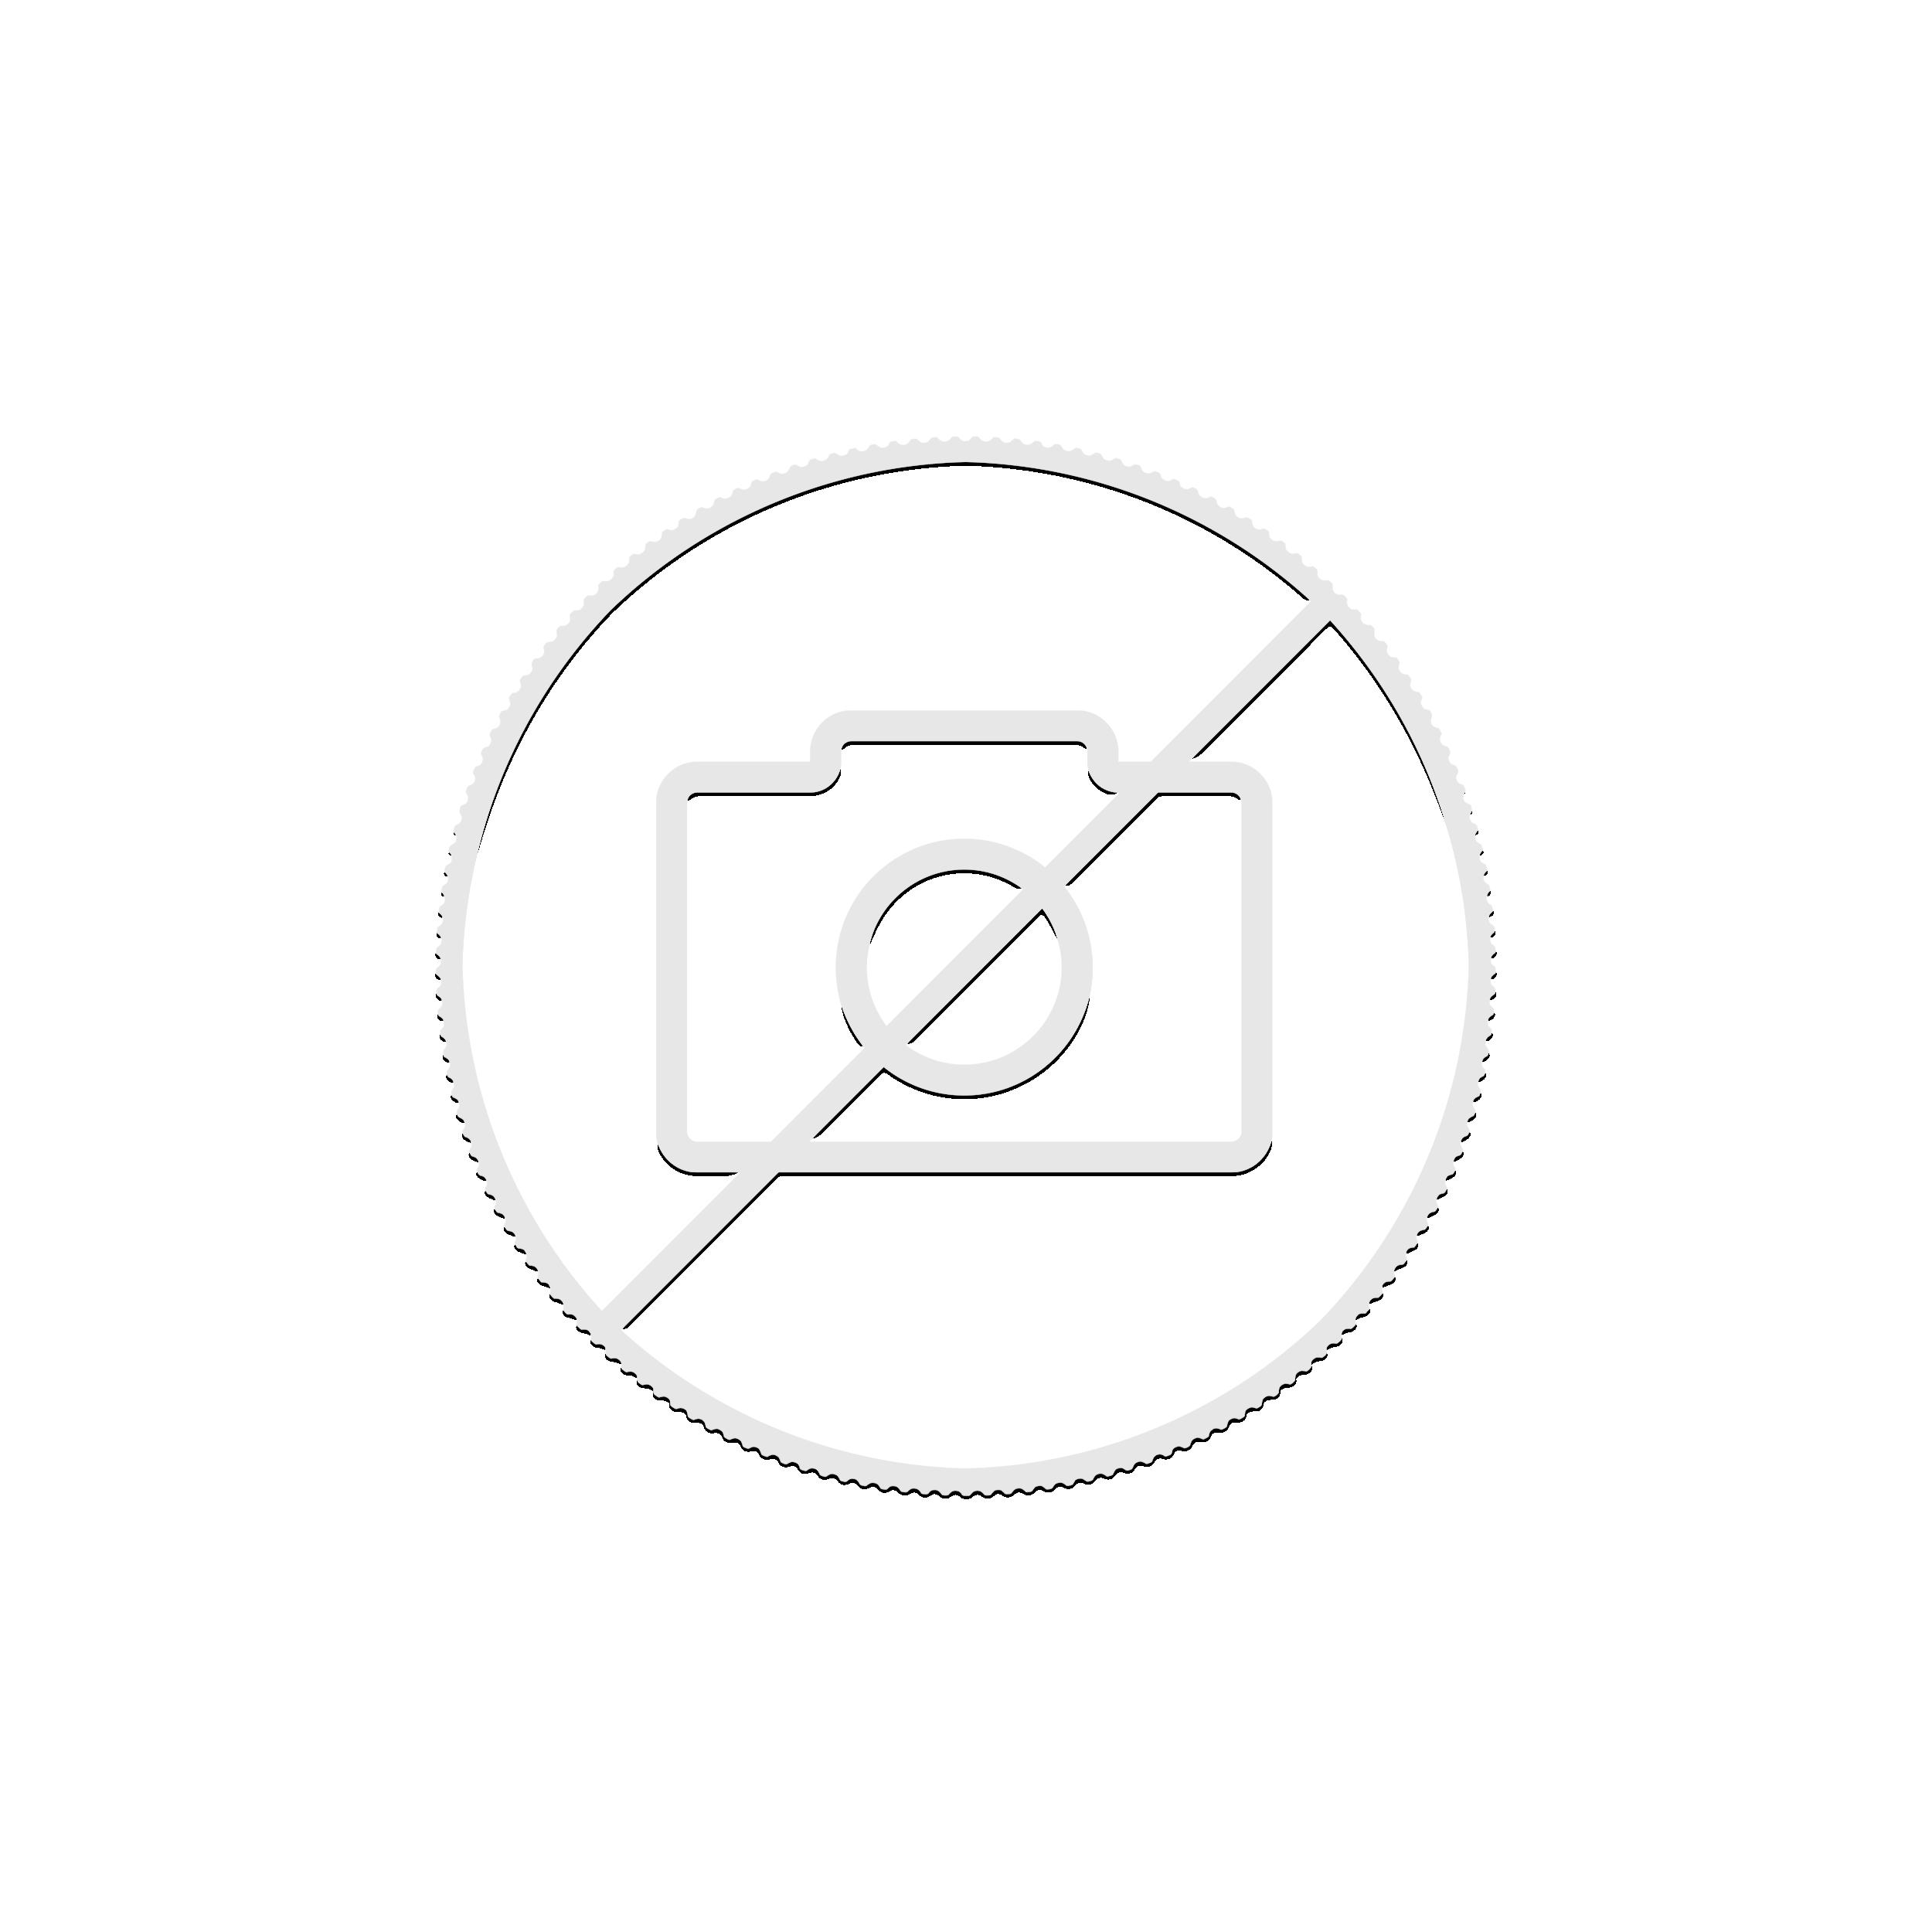 3 troy ounce silver coin mandala art VI 'Persian'